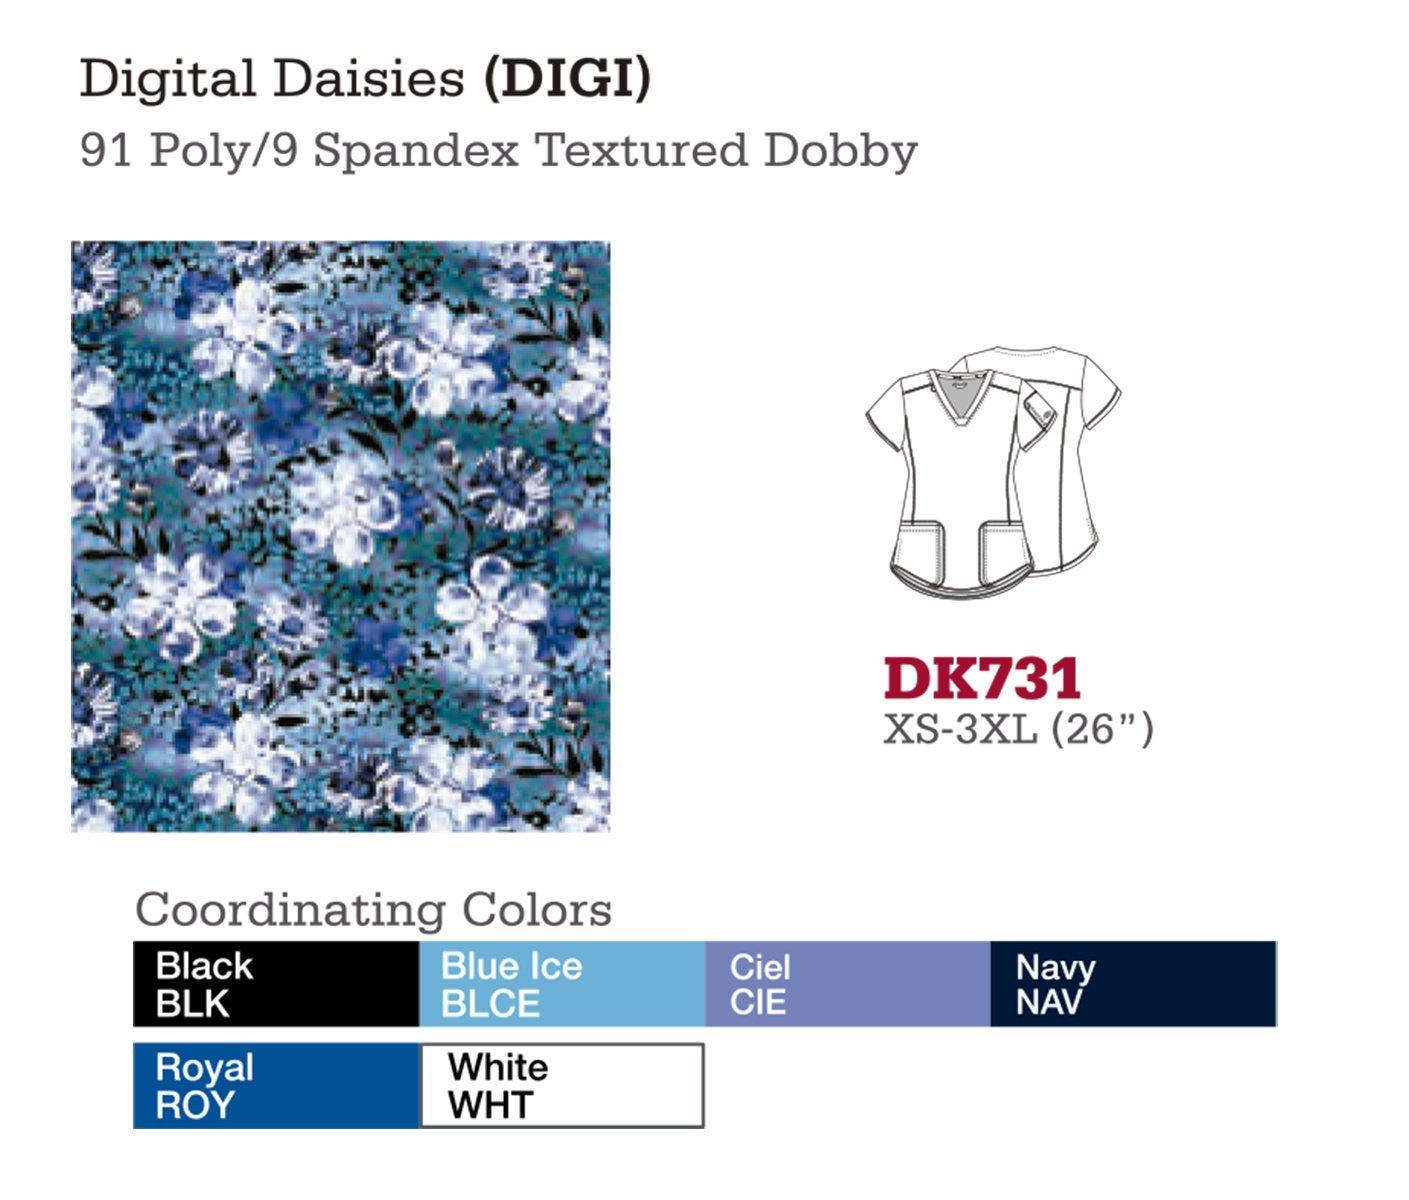 Digital Daisies. DK731.